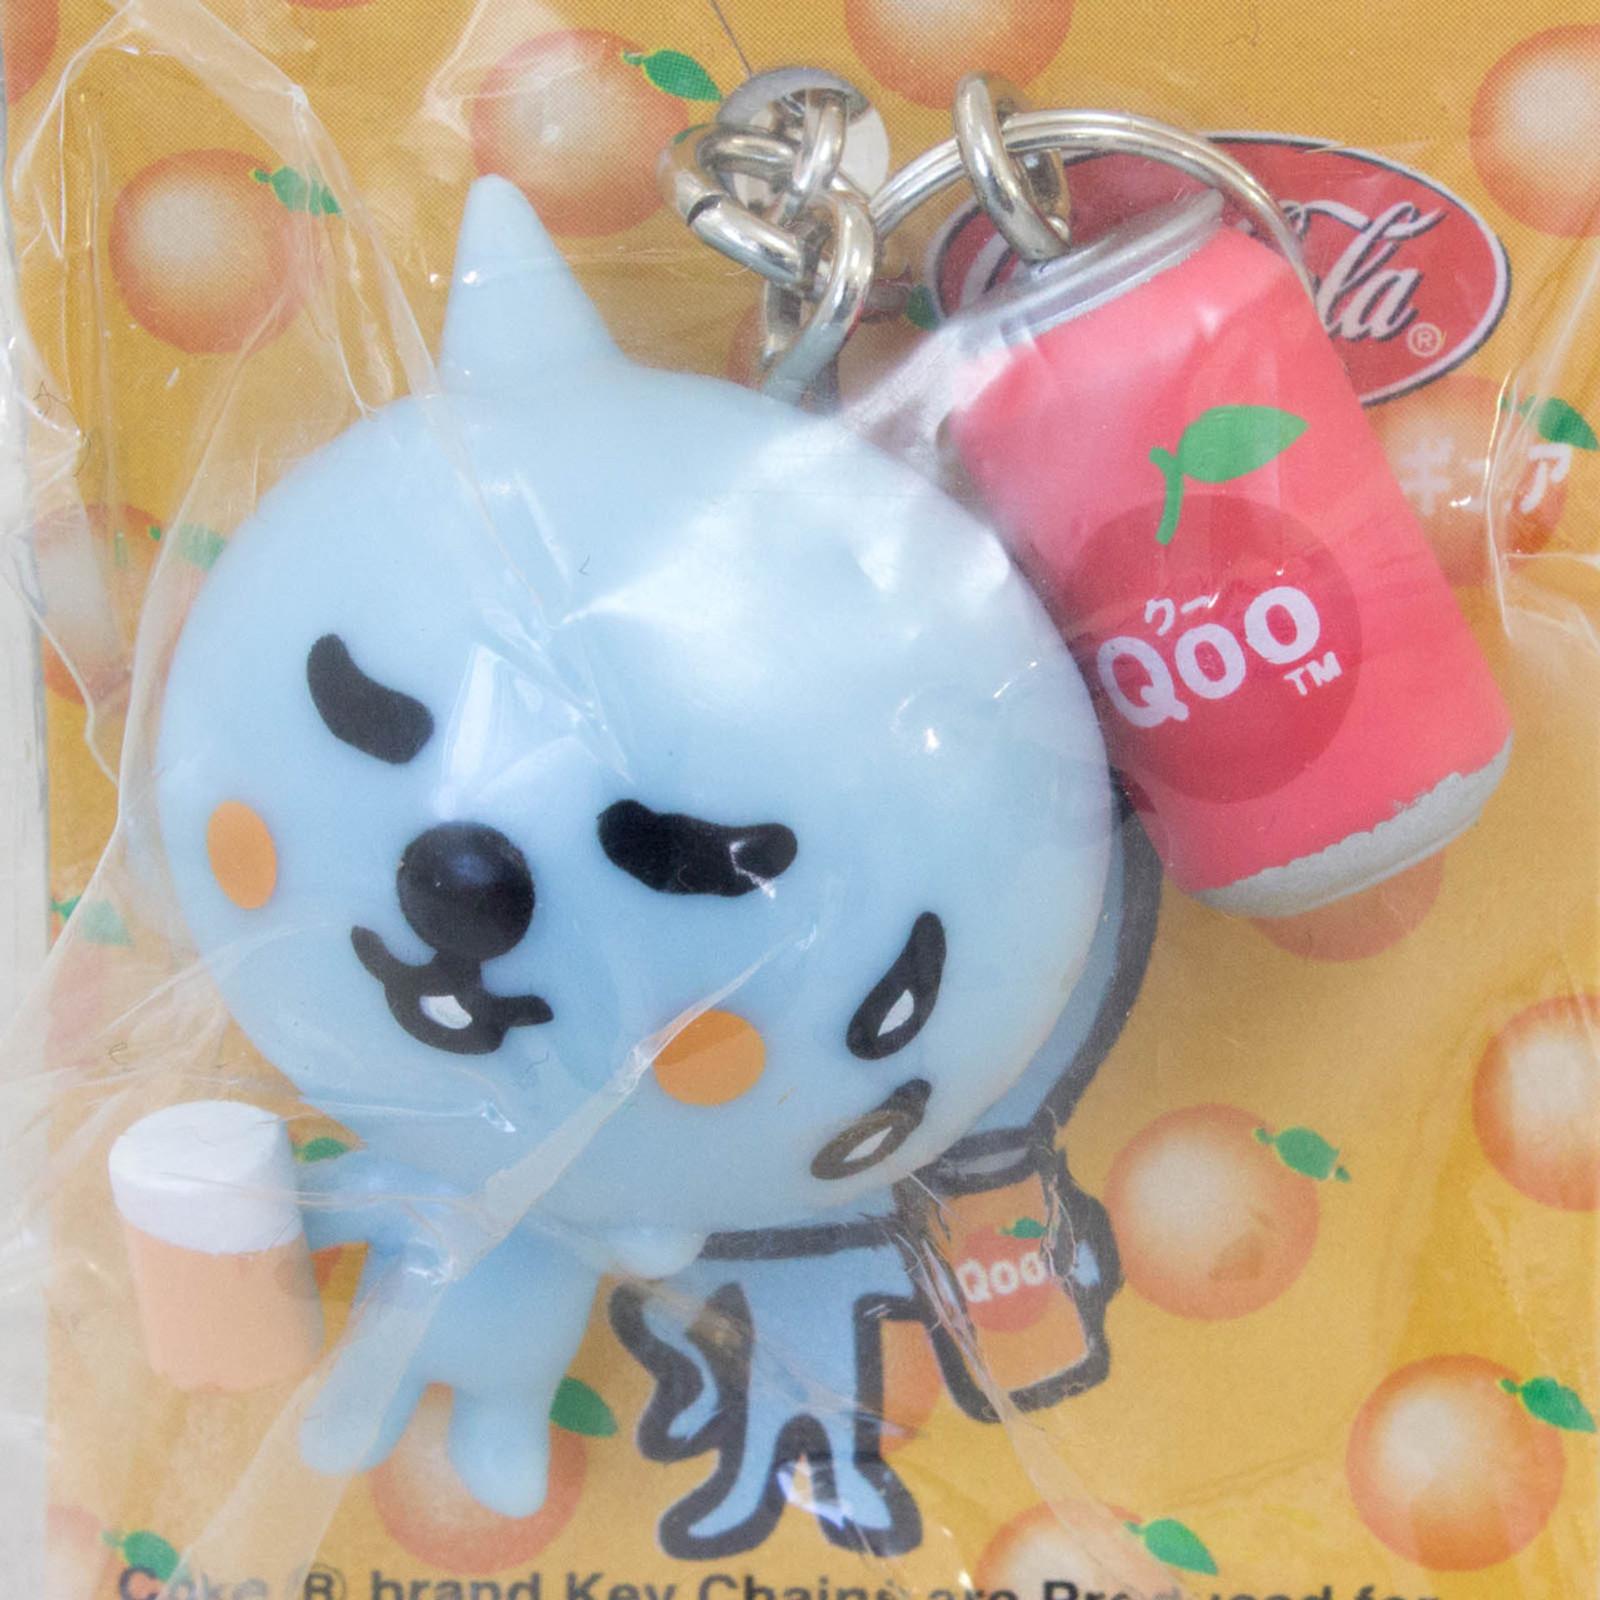 QOO with Apple Juice Can Figure Keychain Coca-Cola SEGA JAPAN 1